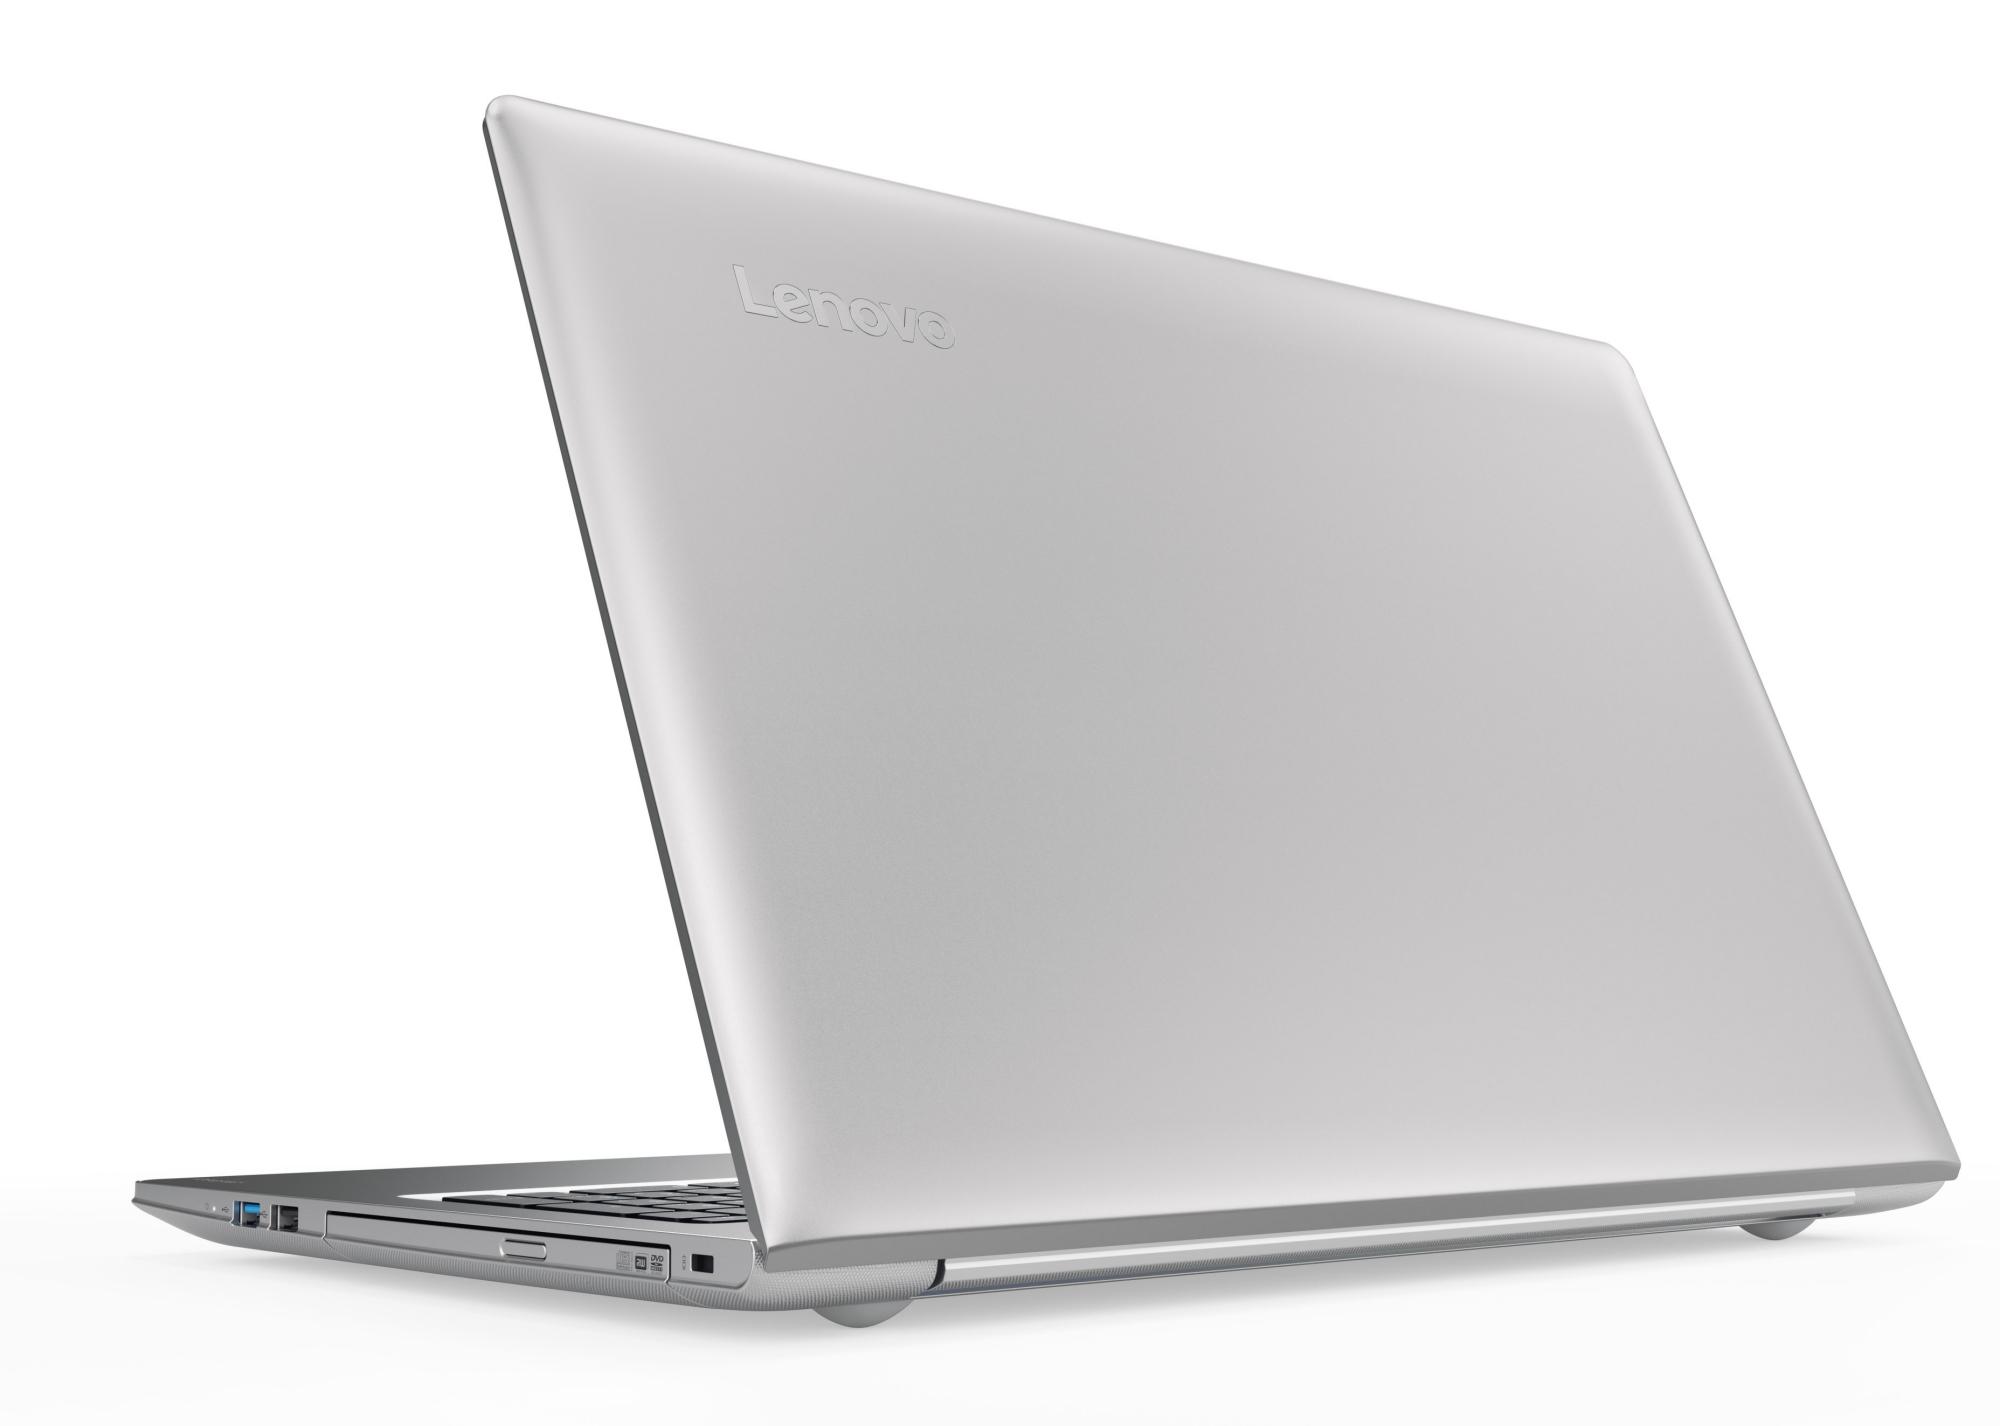 Lenovo Ideapad 510 15ikb Notebook Review Notebookcheck